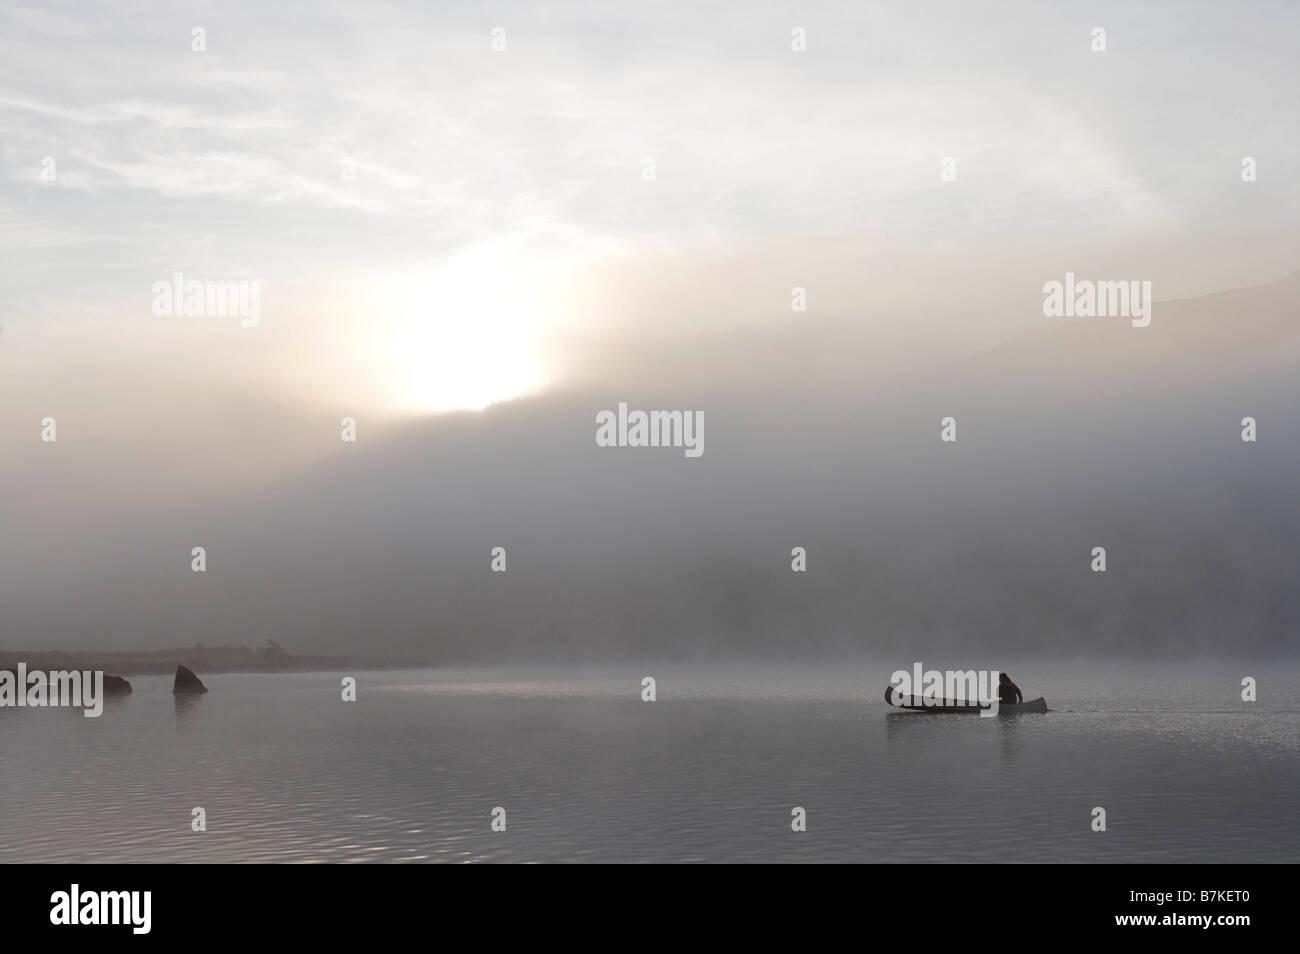 Kayaking in the morning mist. - Stock Image